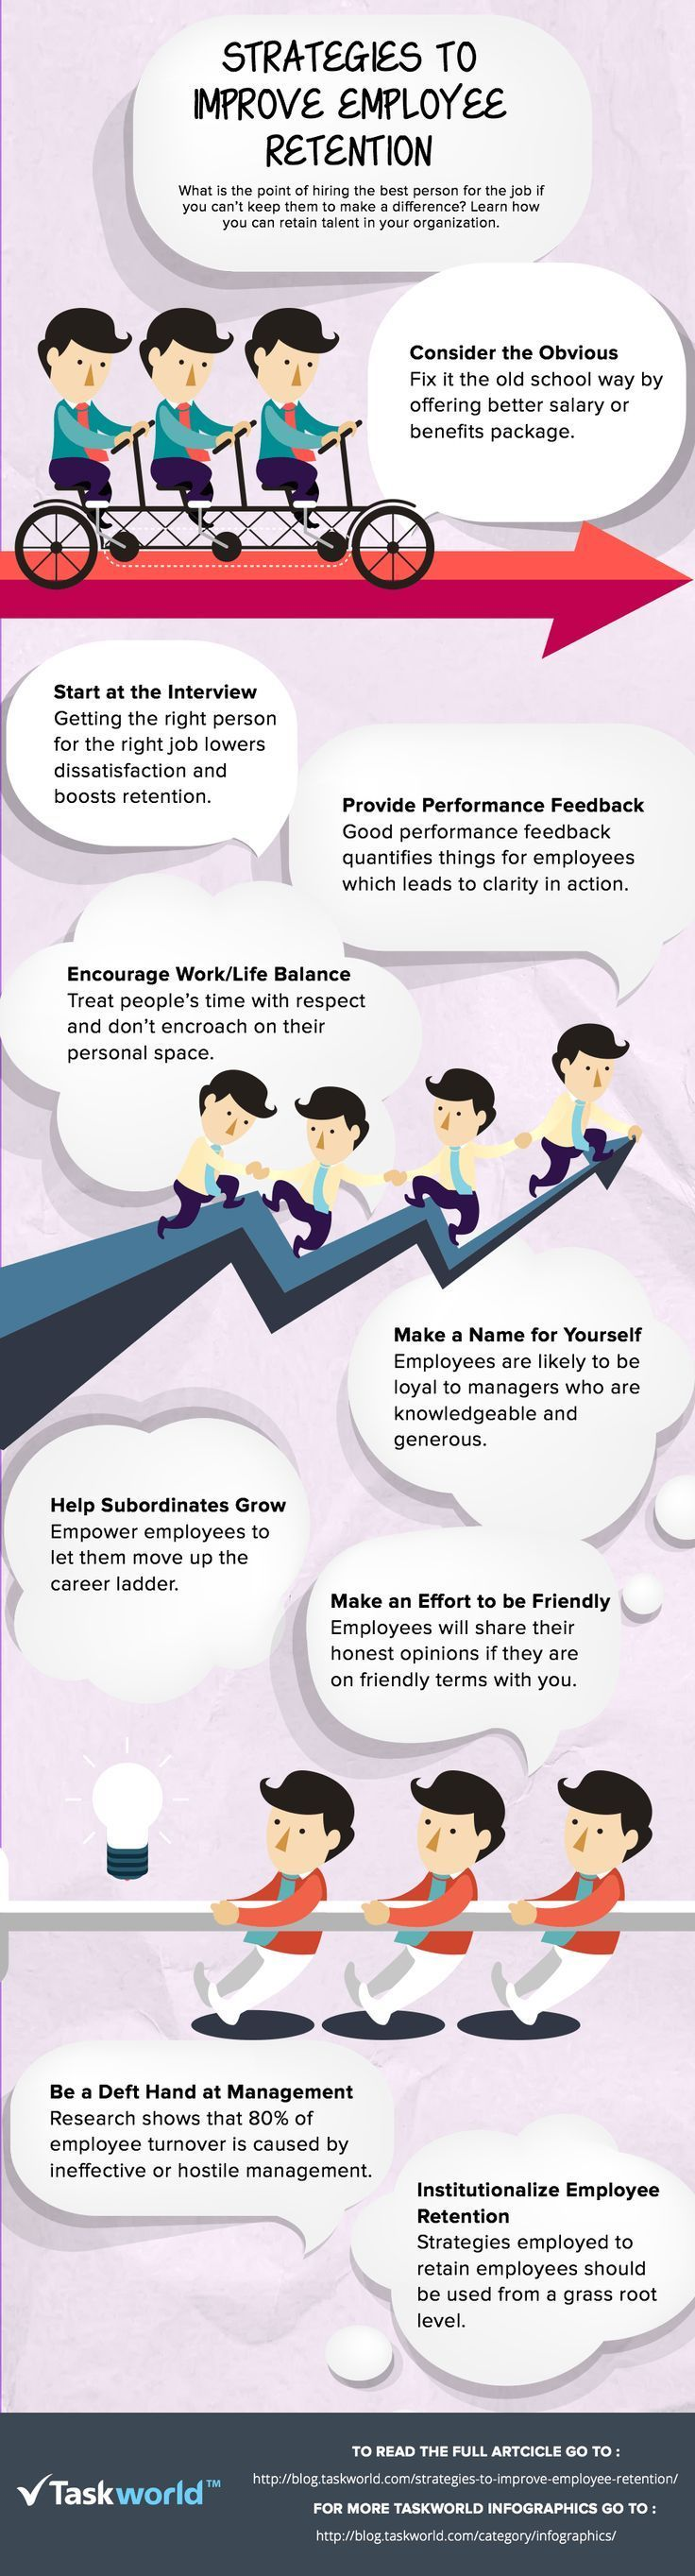 Management employee engagement management and motivation strategies to improve employee